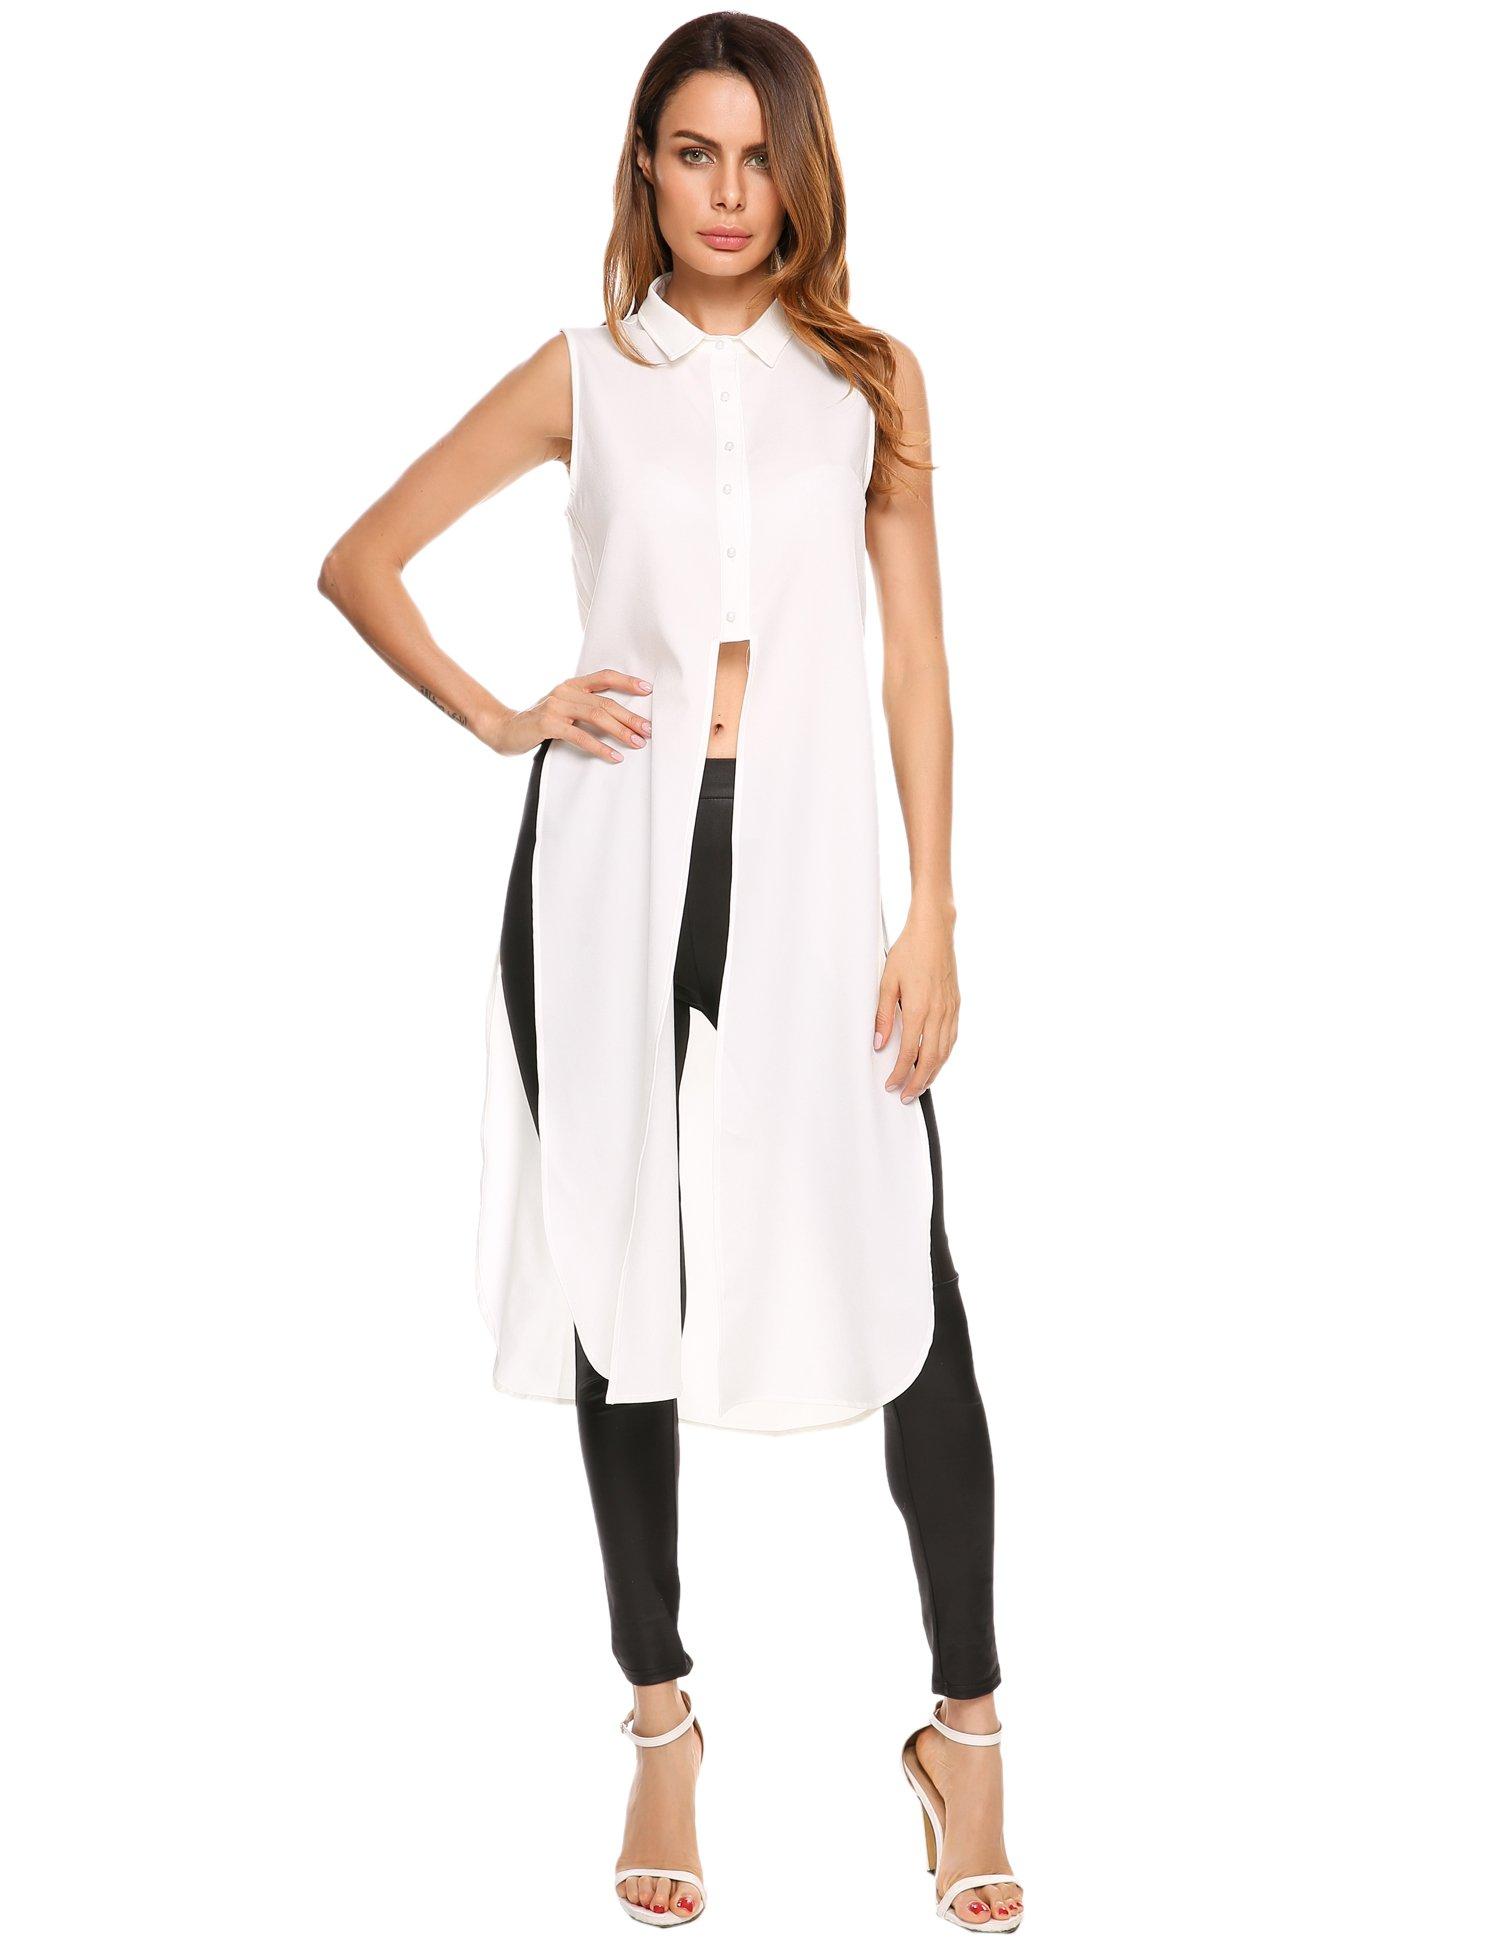 Zeagoo Women's Casual Summer V-Neck Tank Tops Chiffon Blouse Shirt,White,XL